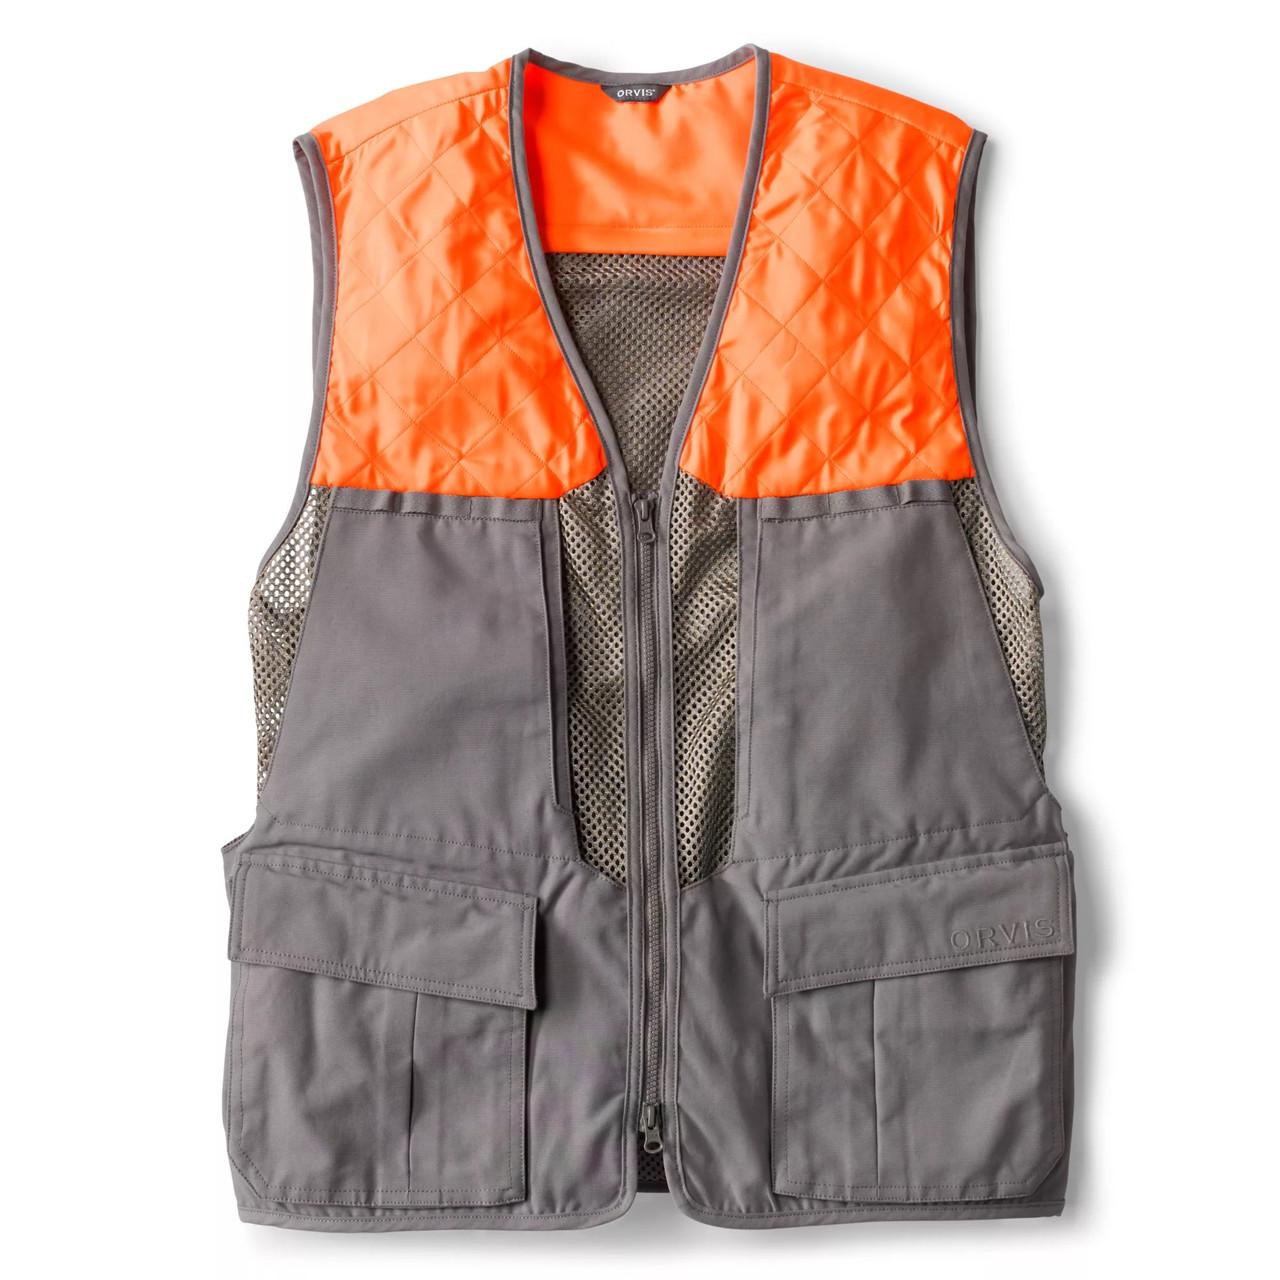 Orvis Men's Upland Hunting Vest 28BC